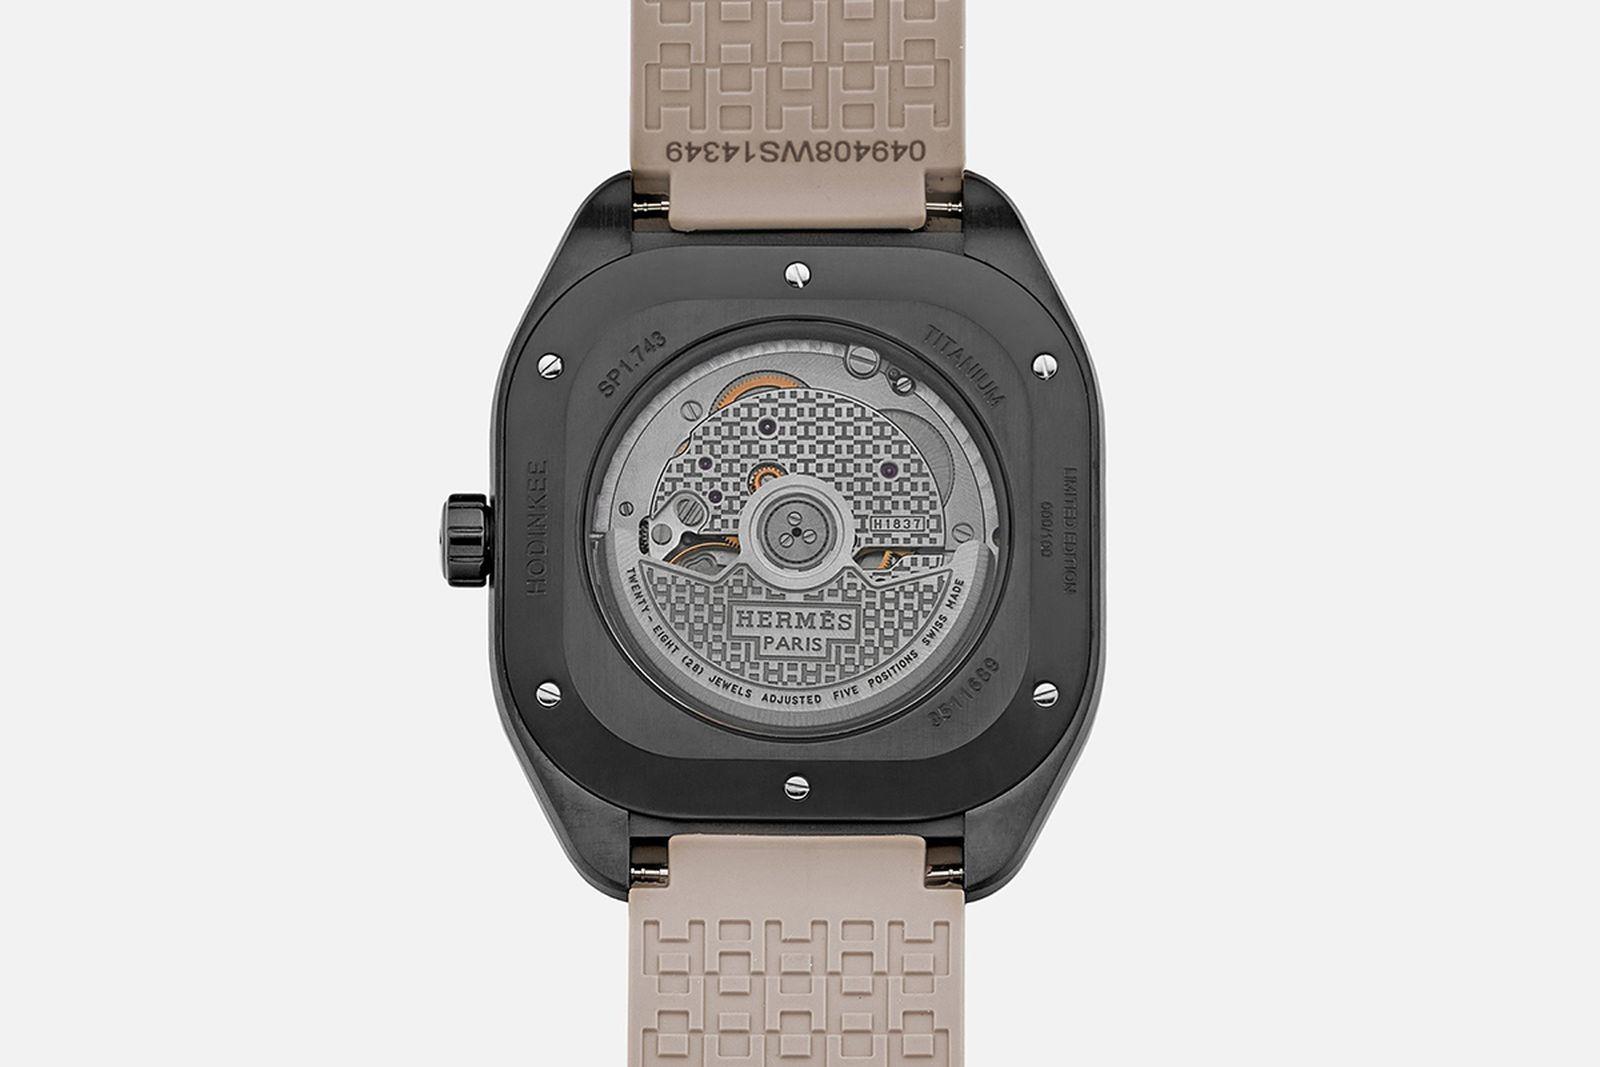 hermes-h08-hodinkee-watch (2)